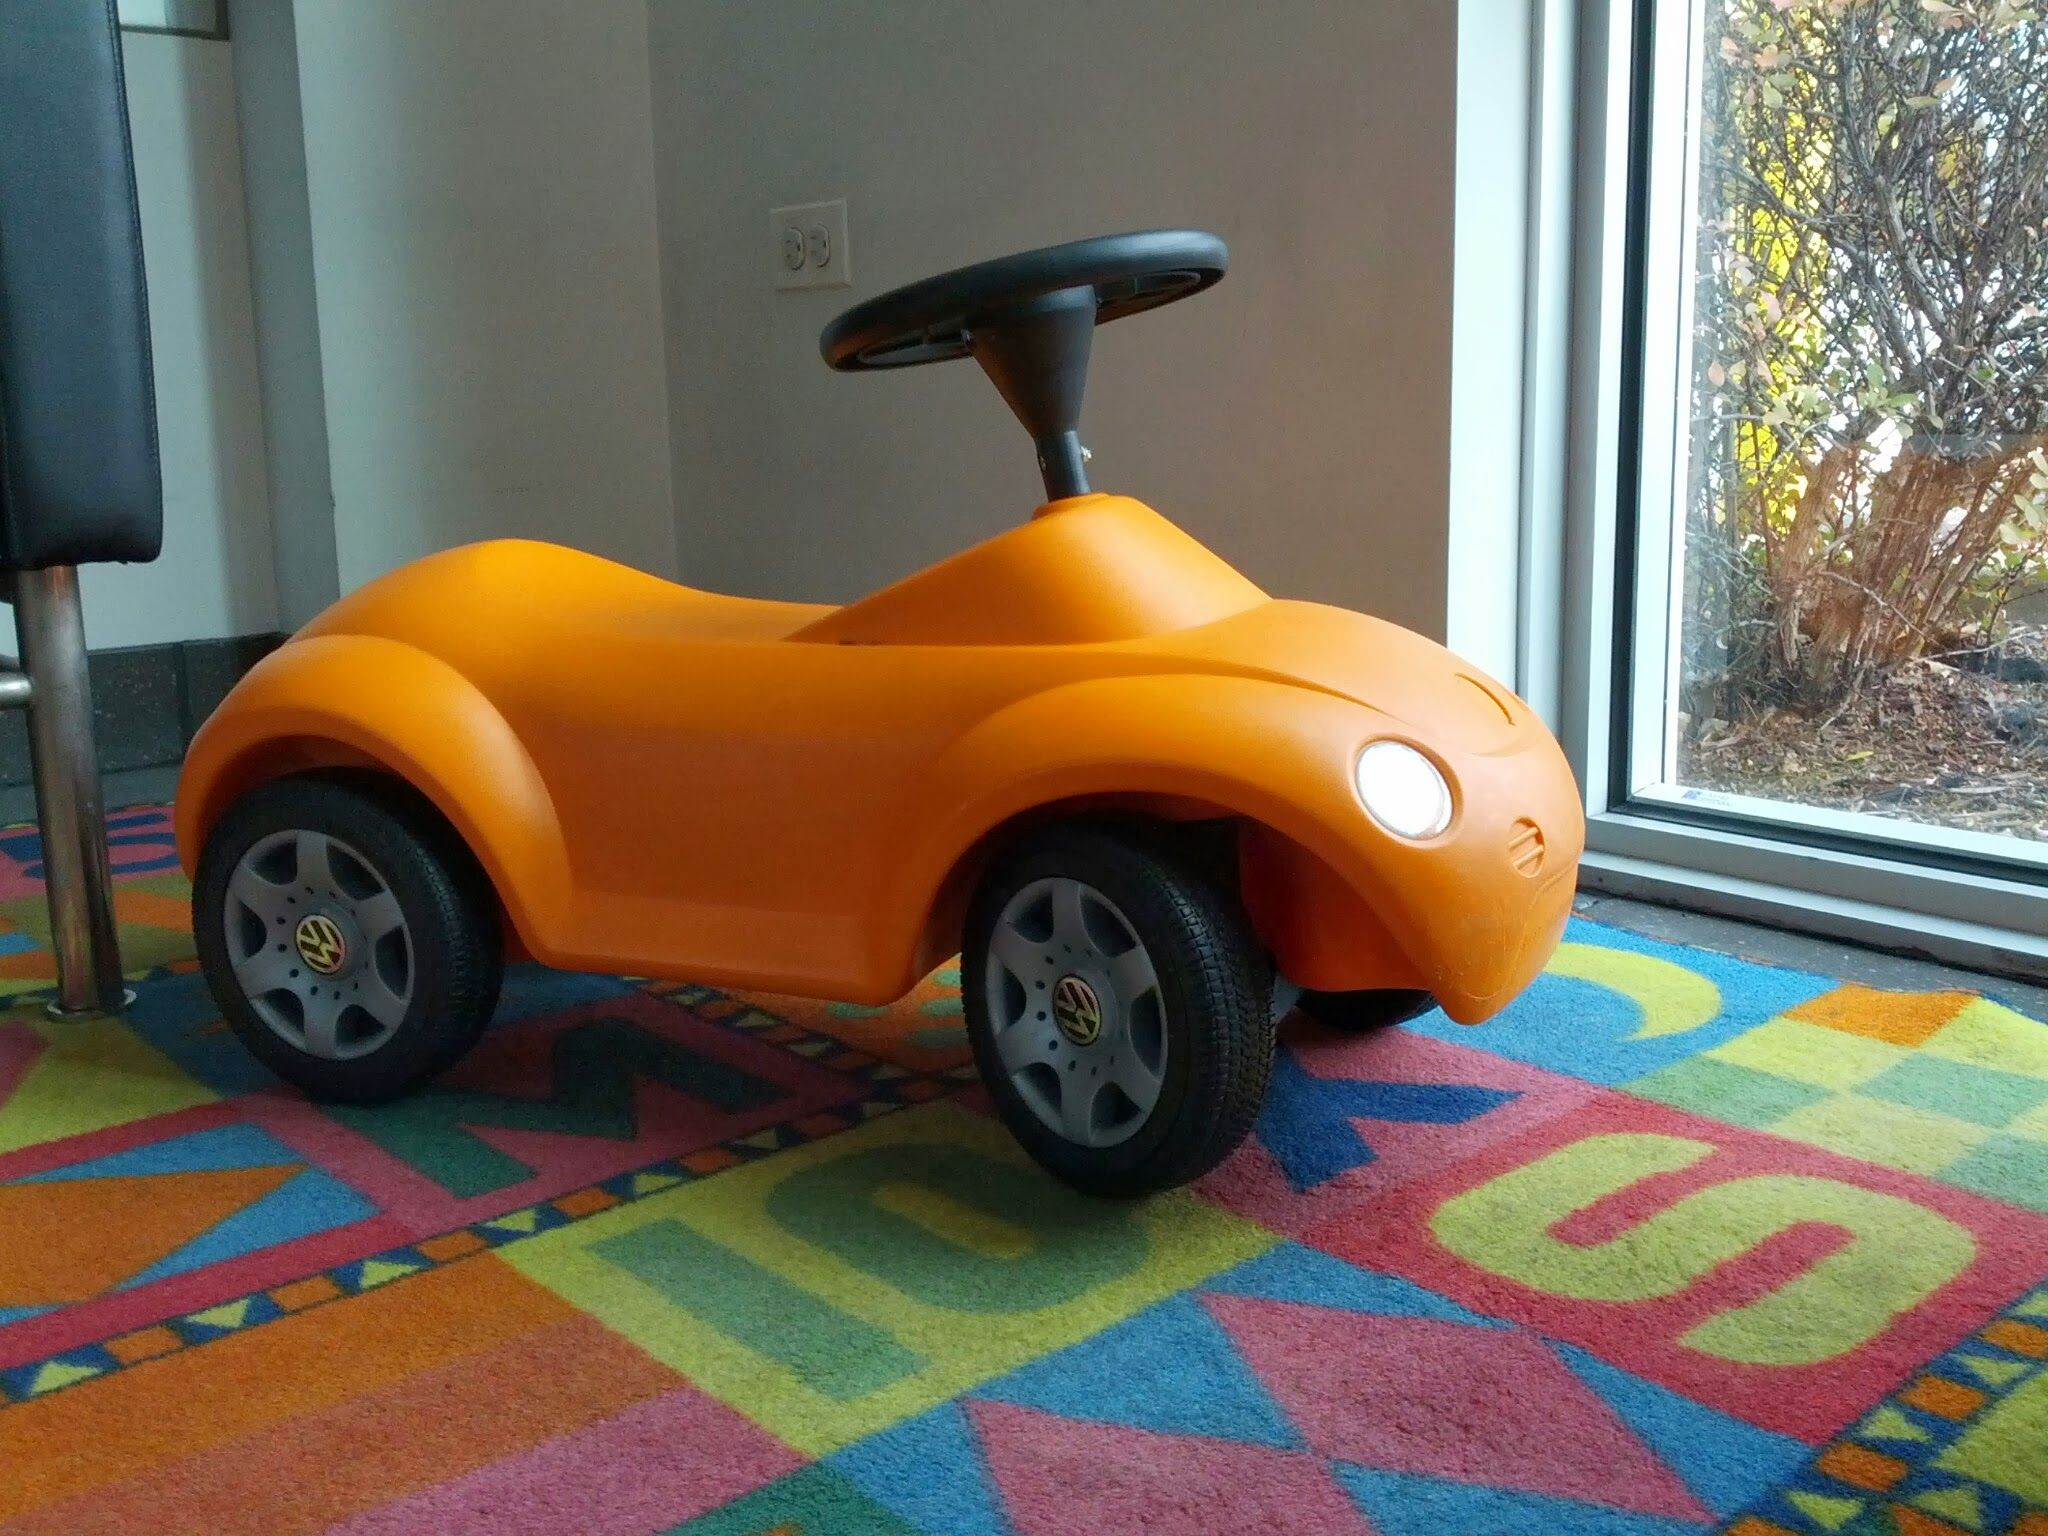 Fastest Volkswagen In The Whole Wide World Toy Car Volkswagen Wide World